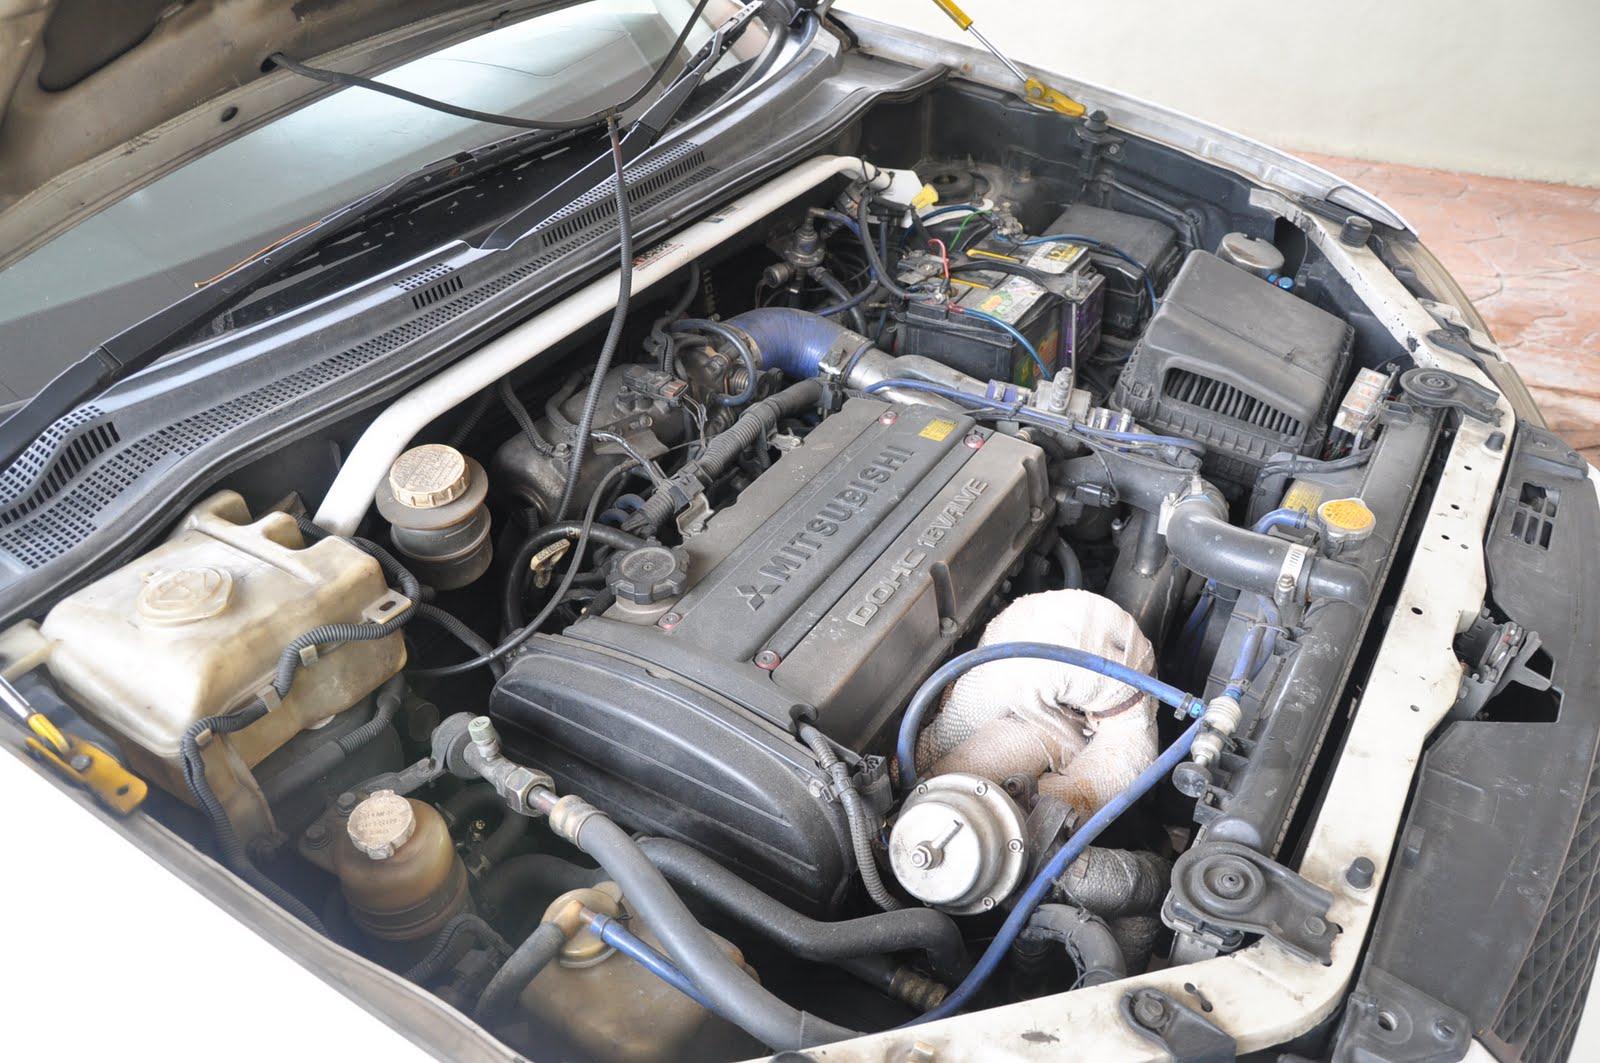 mitsubishi airtrek turbo engine diagram diy wiring diagrams u2022 rh dancesalsa co Mitsubishi Airtrek Turbo Engine Bay Mitsubishi Lancer Evolution